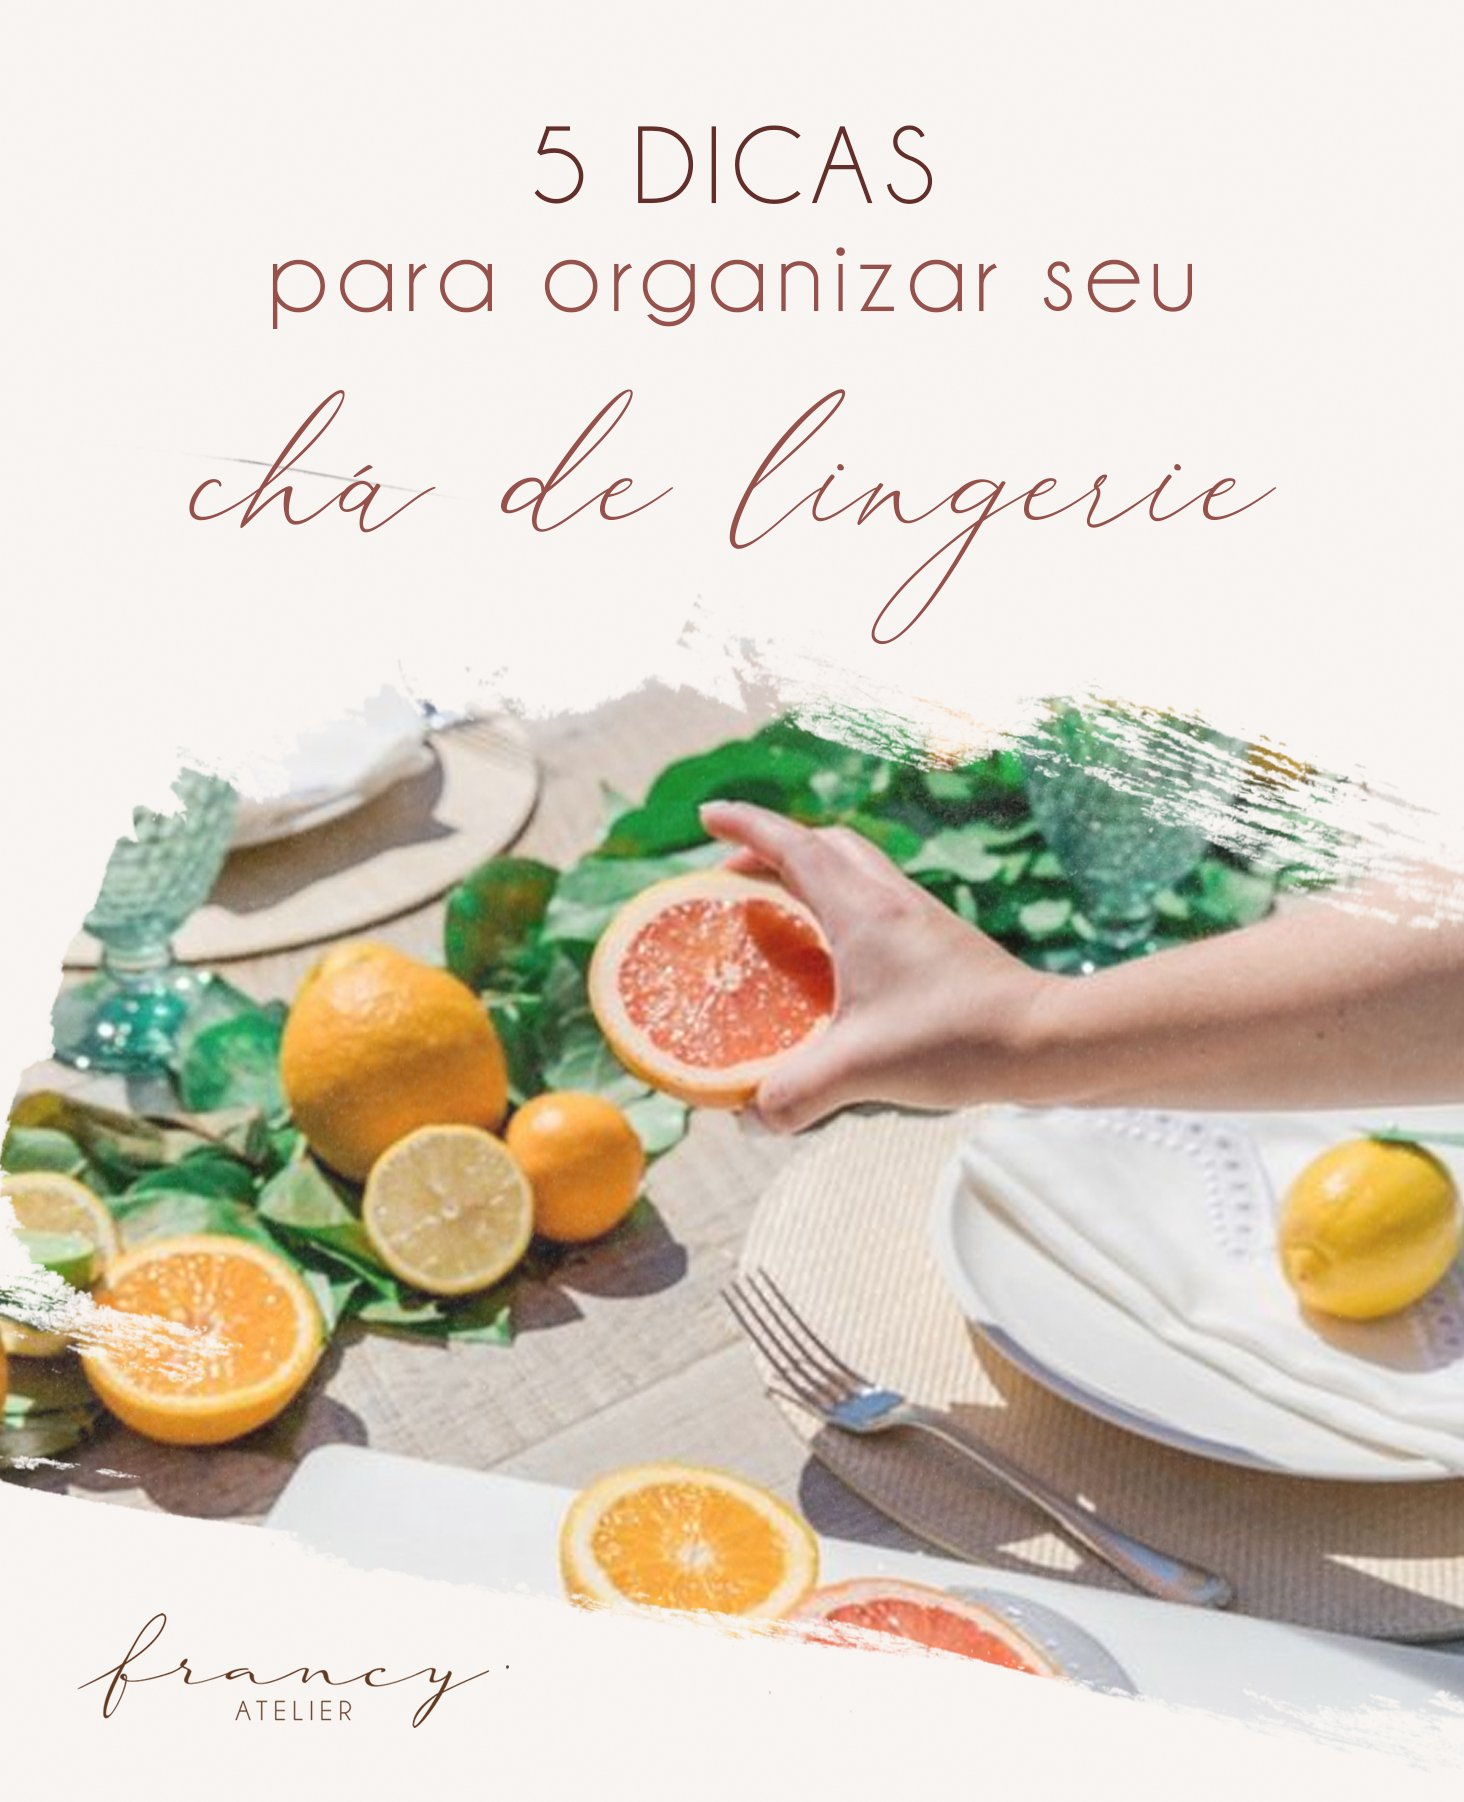 Chá de Lingerie 1